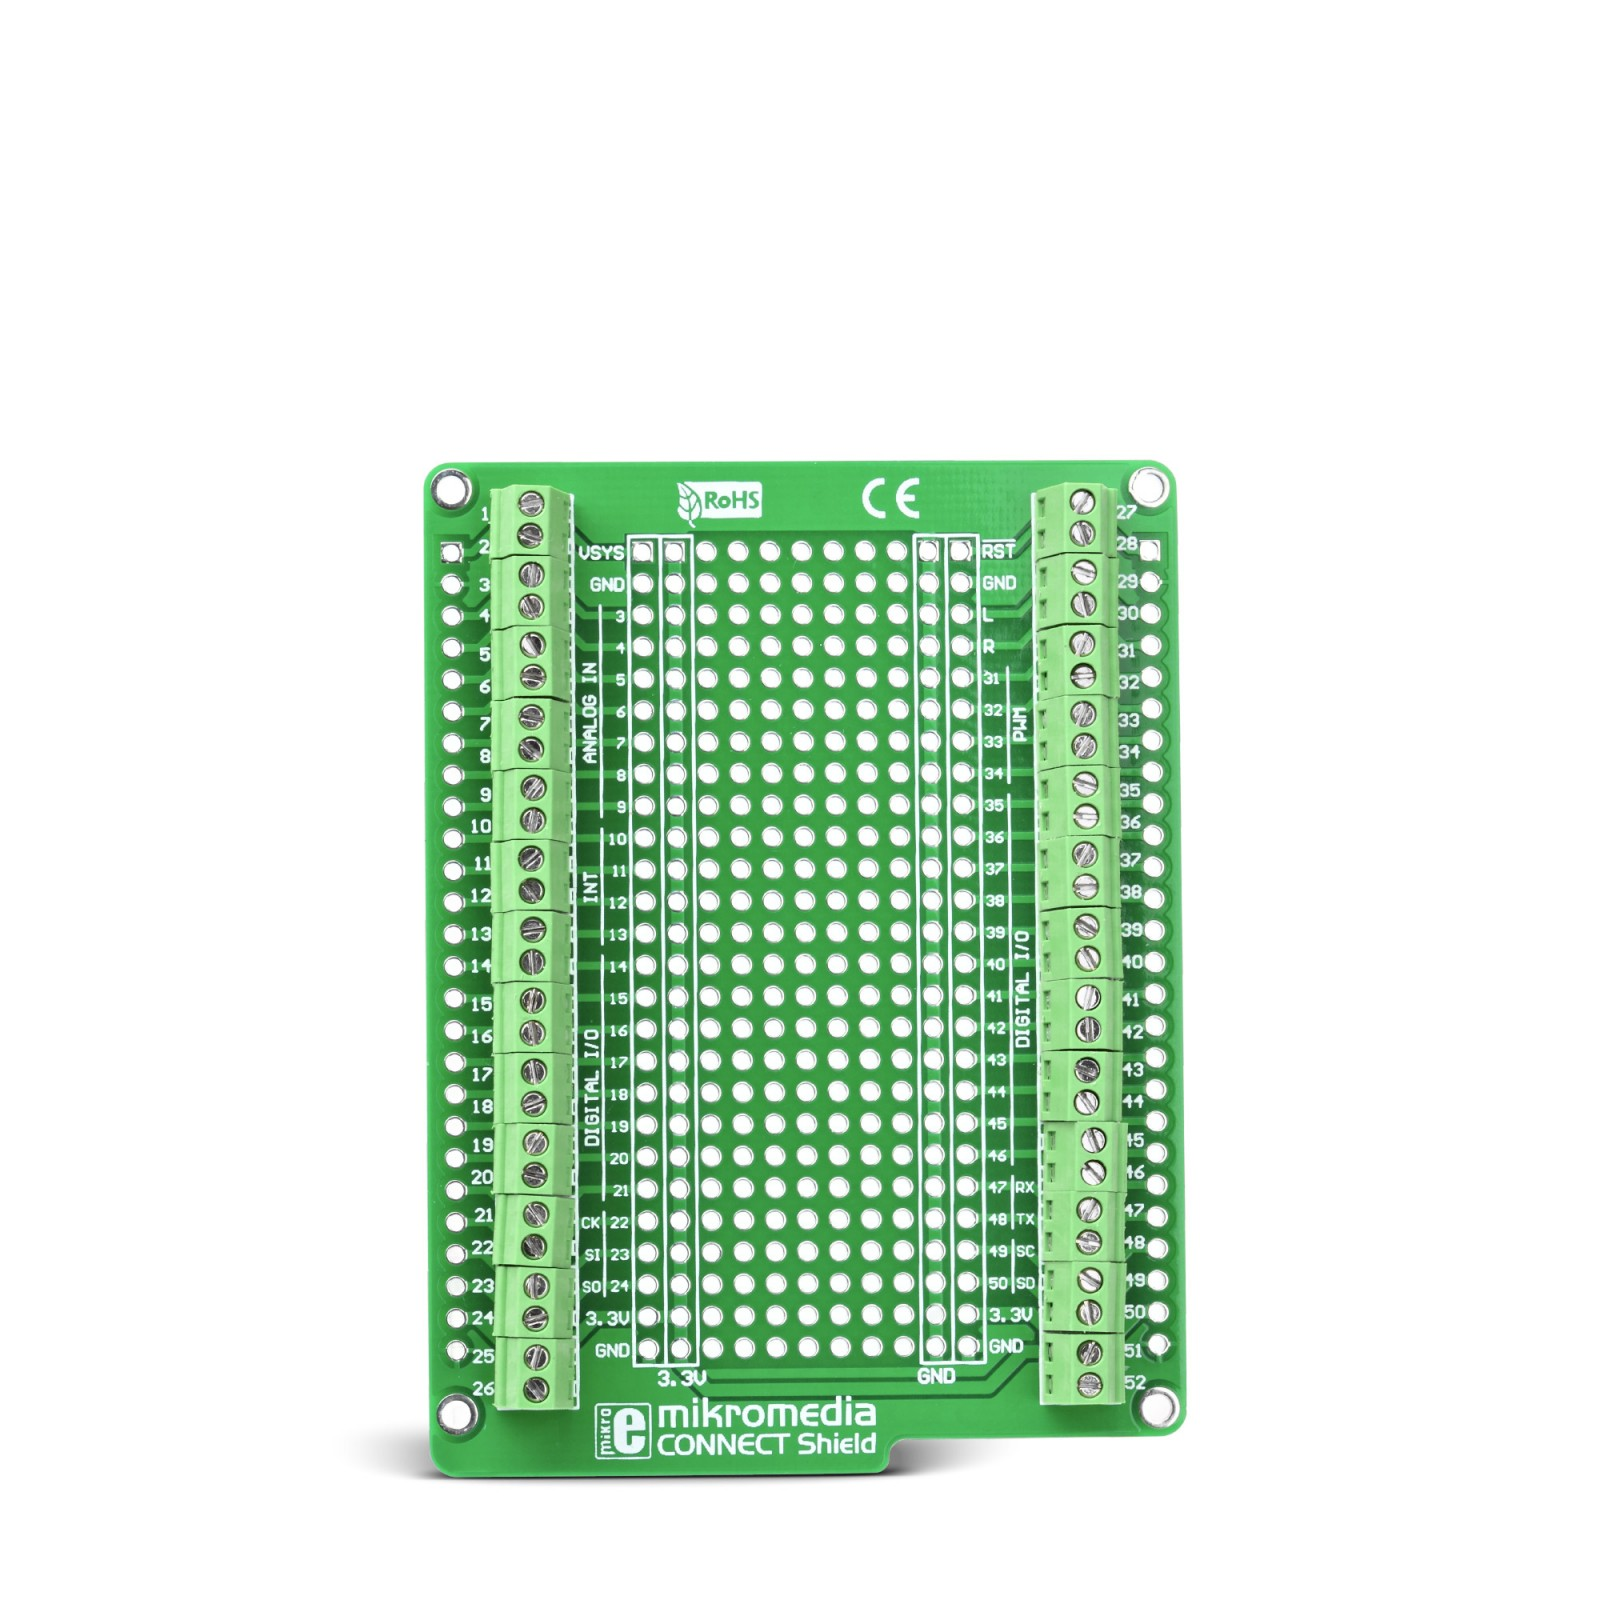 Mikroelektronika Mikromedia Connect Shield Extension Board Pin How To Make Custom Shields For A Microcontroller Mgctlbxnmzp Mgctlbxv5112 Mgctlbxlc Mgctlbxpprestashop